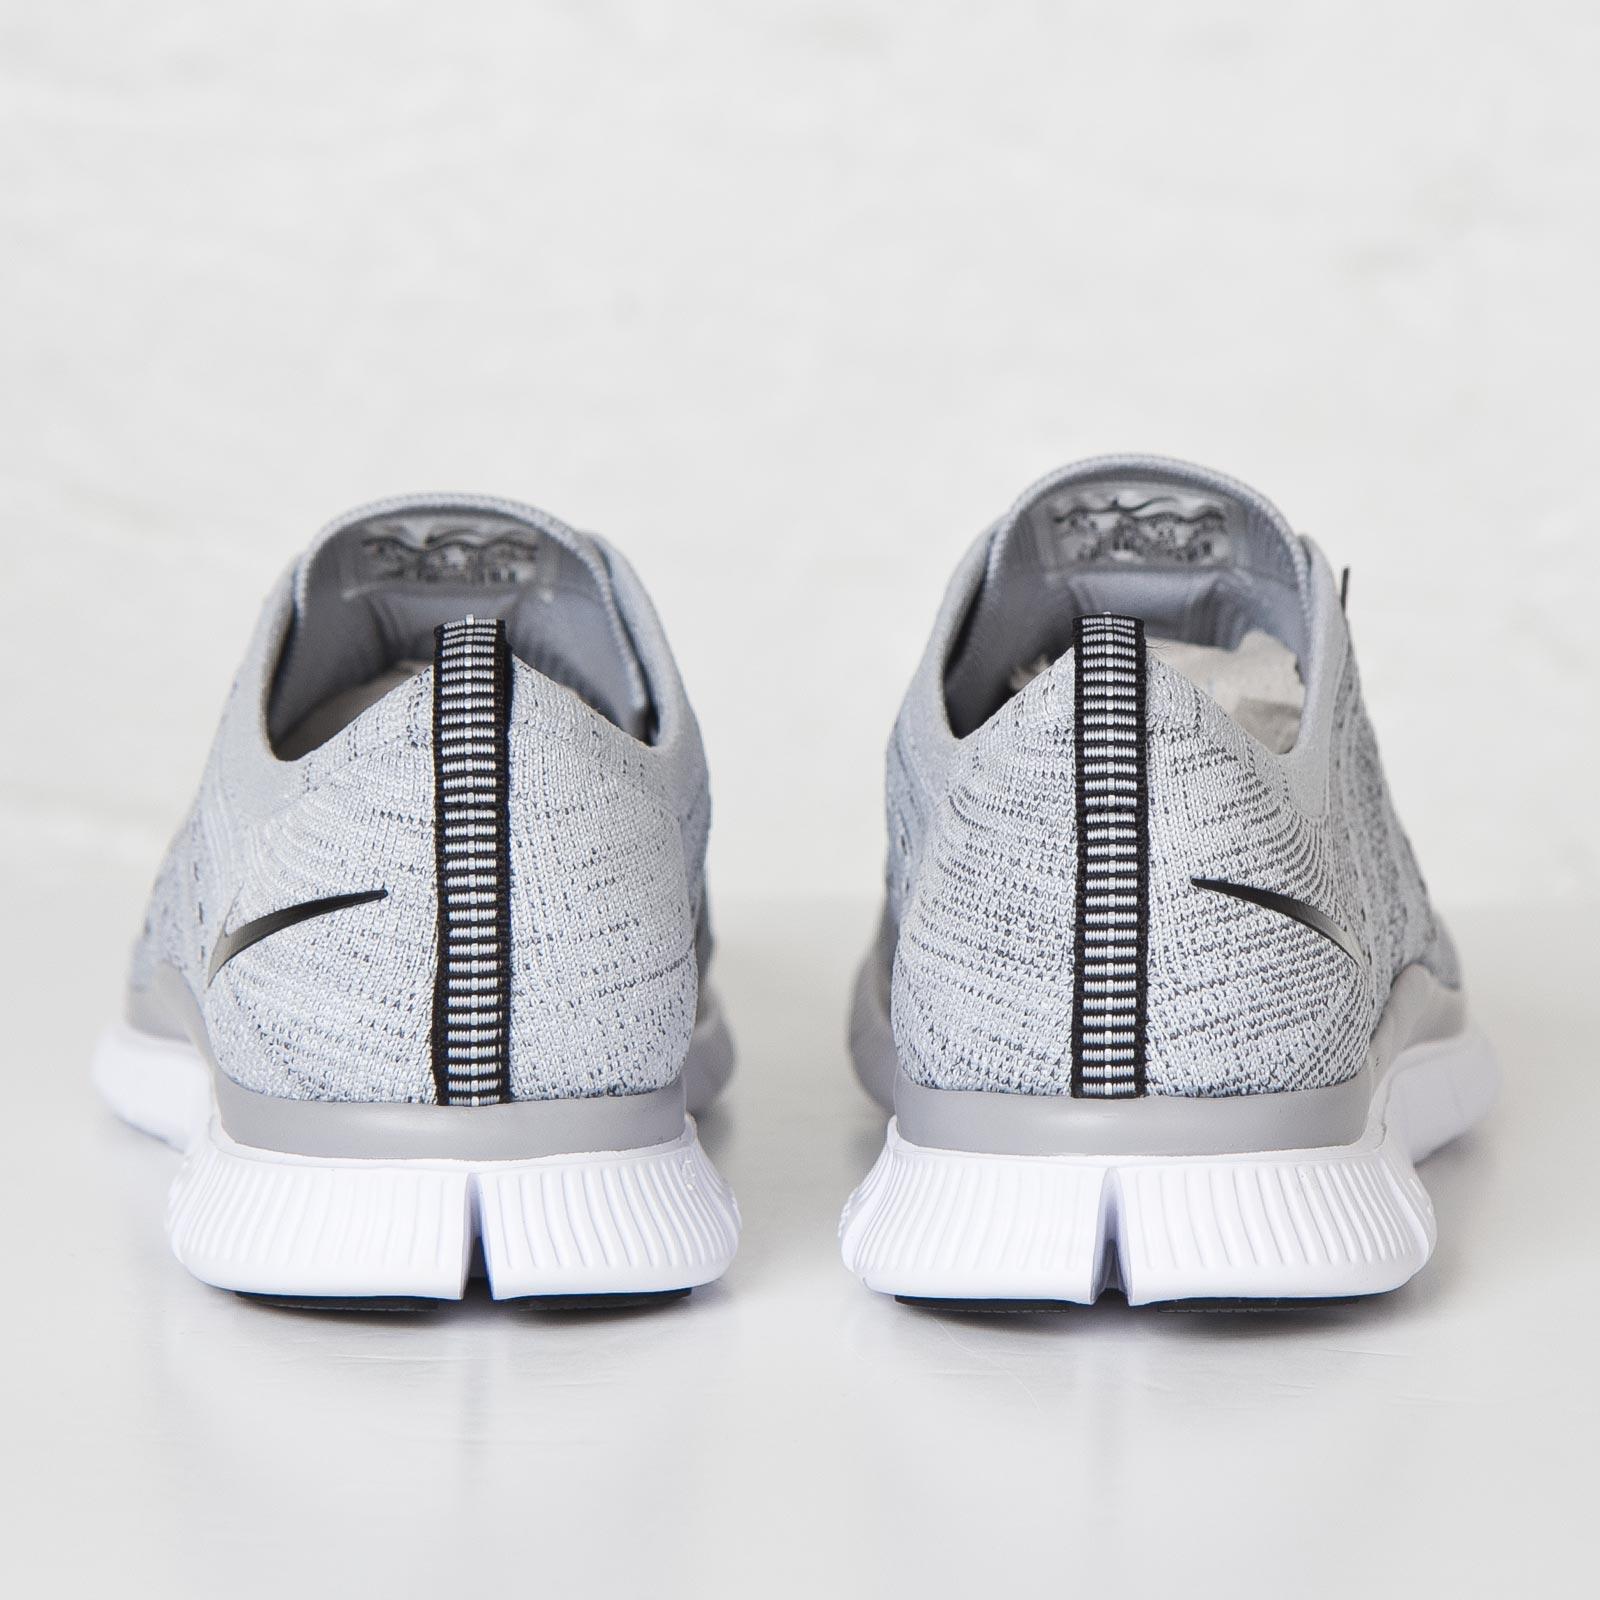 fdab762aed9f Nike Free Flyknit NSW - 599459-002 - Sneakersnstuff